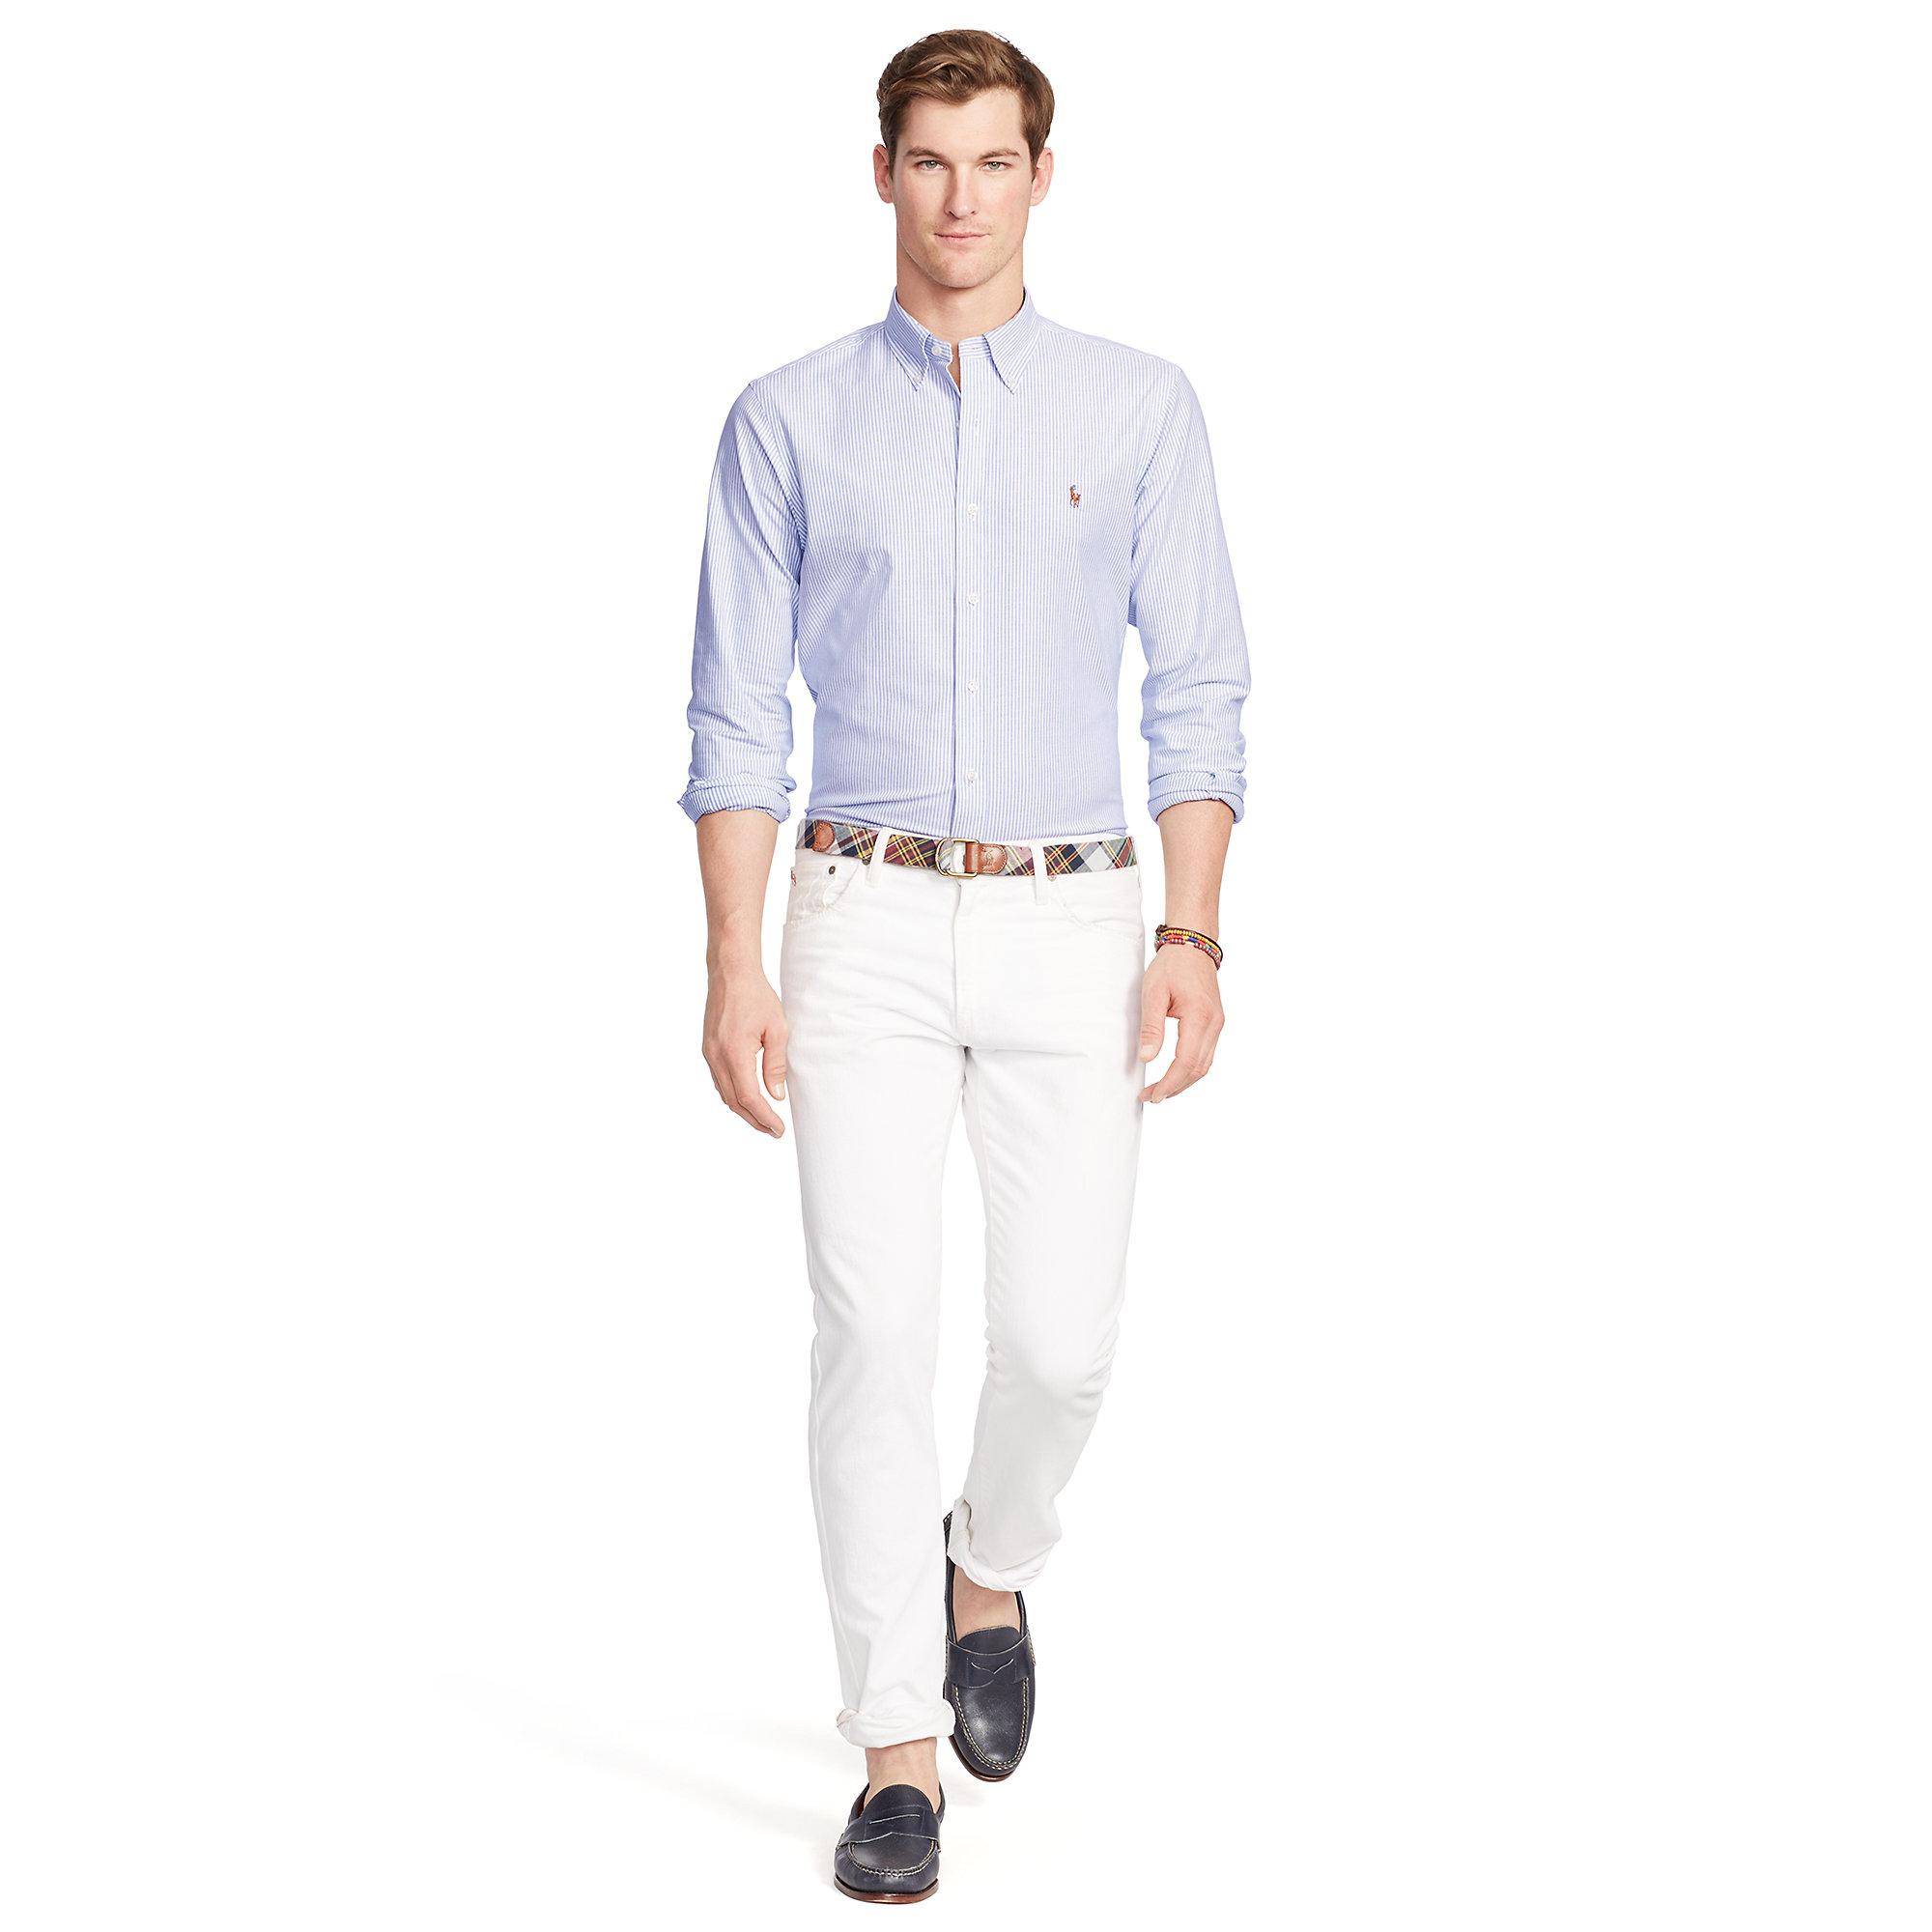 ba1307b5a4b Lyst - Polo Ralph Lauren Slim-fit Stretch Oxford Shirt in Blue for Men